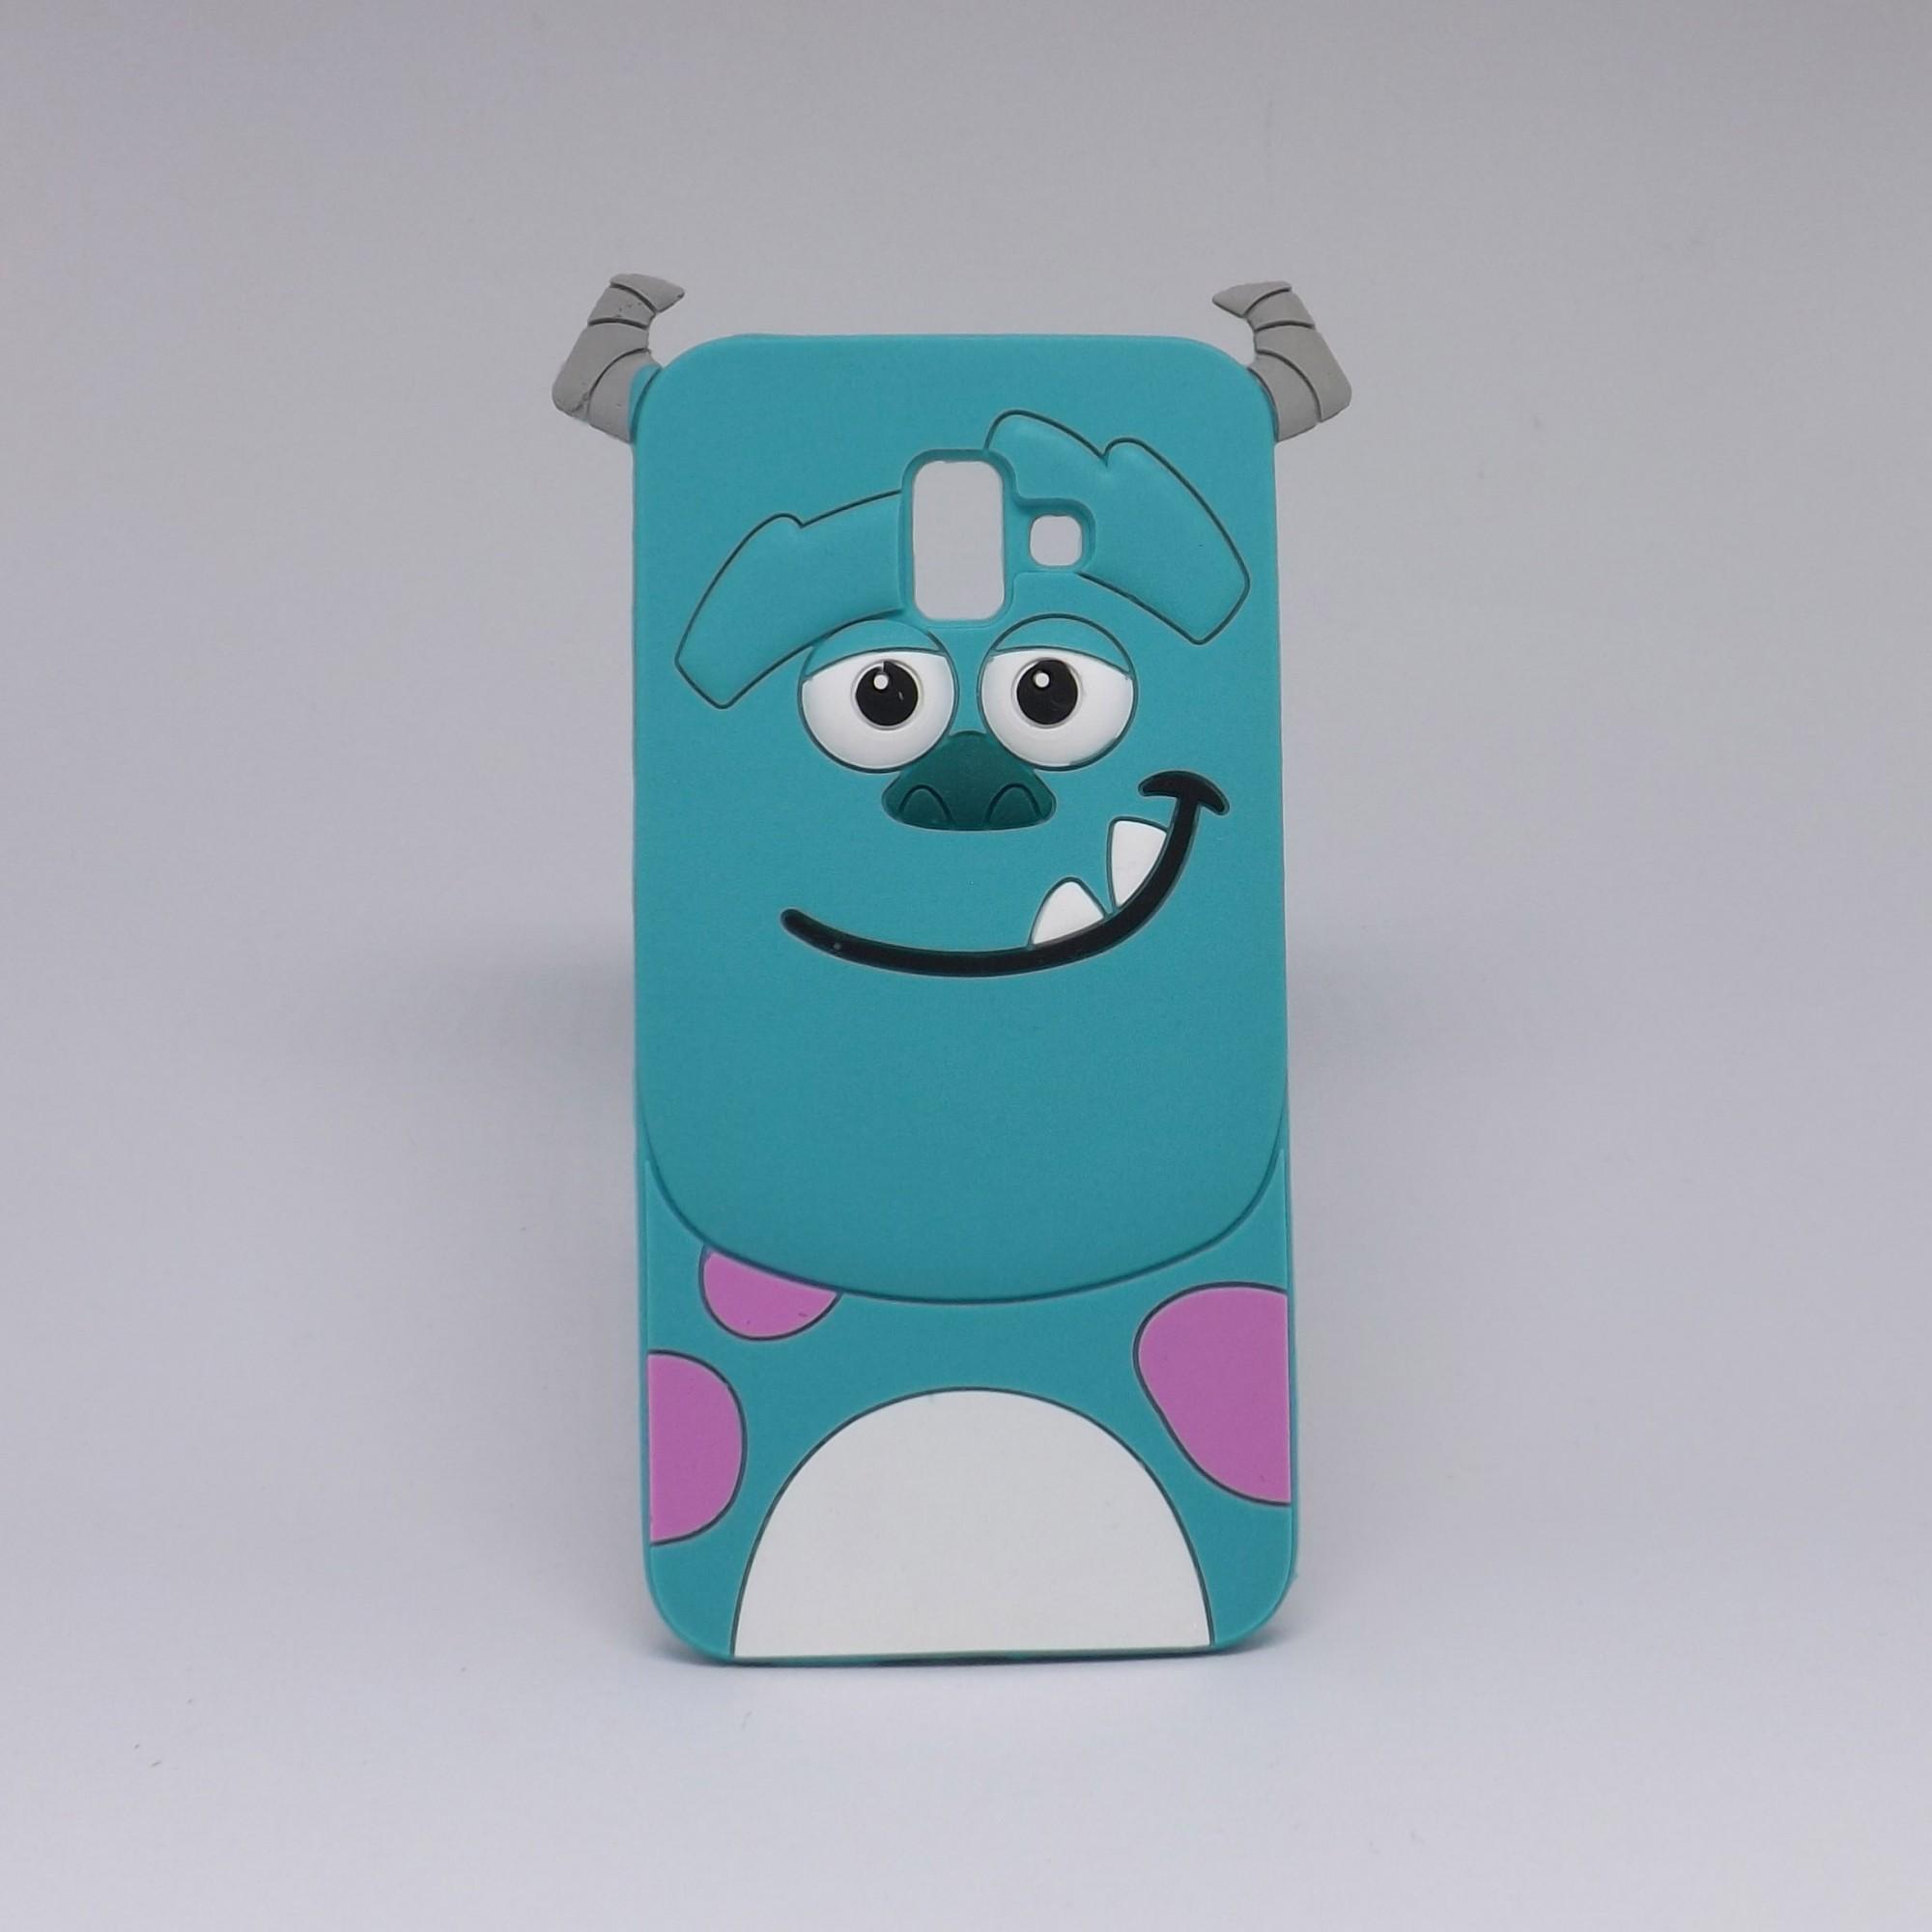 Capa Samsung Galaxy J6 Plus Personagens - Sullivan